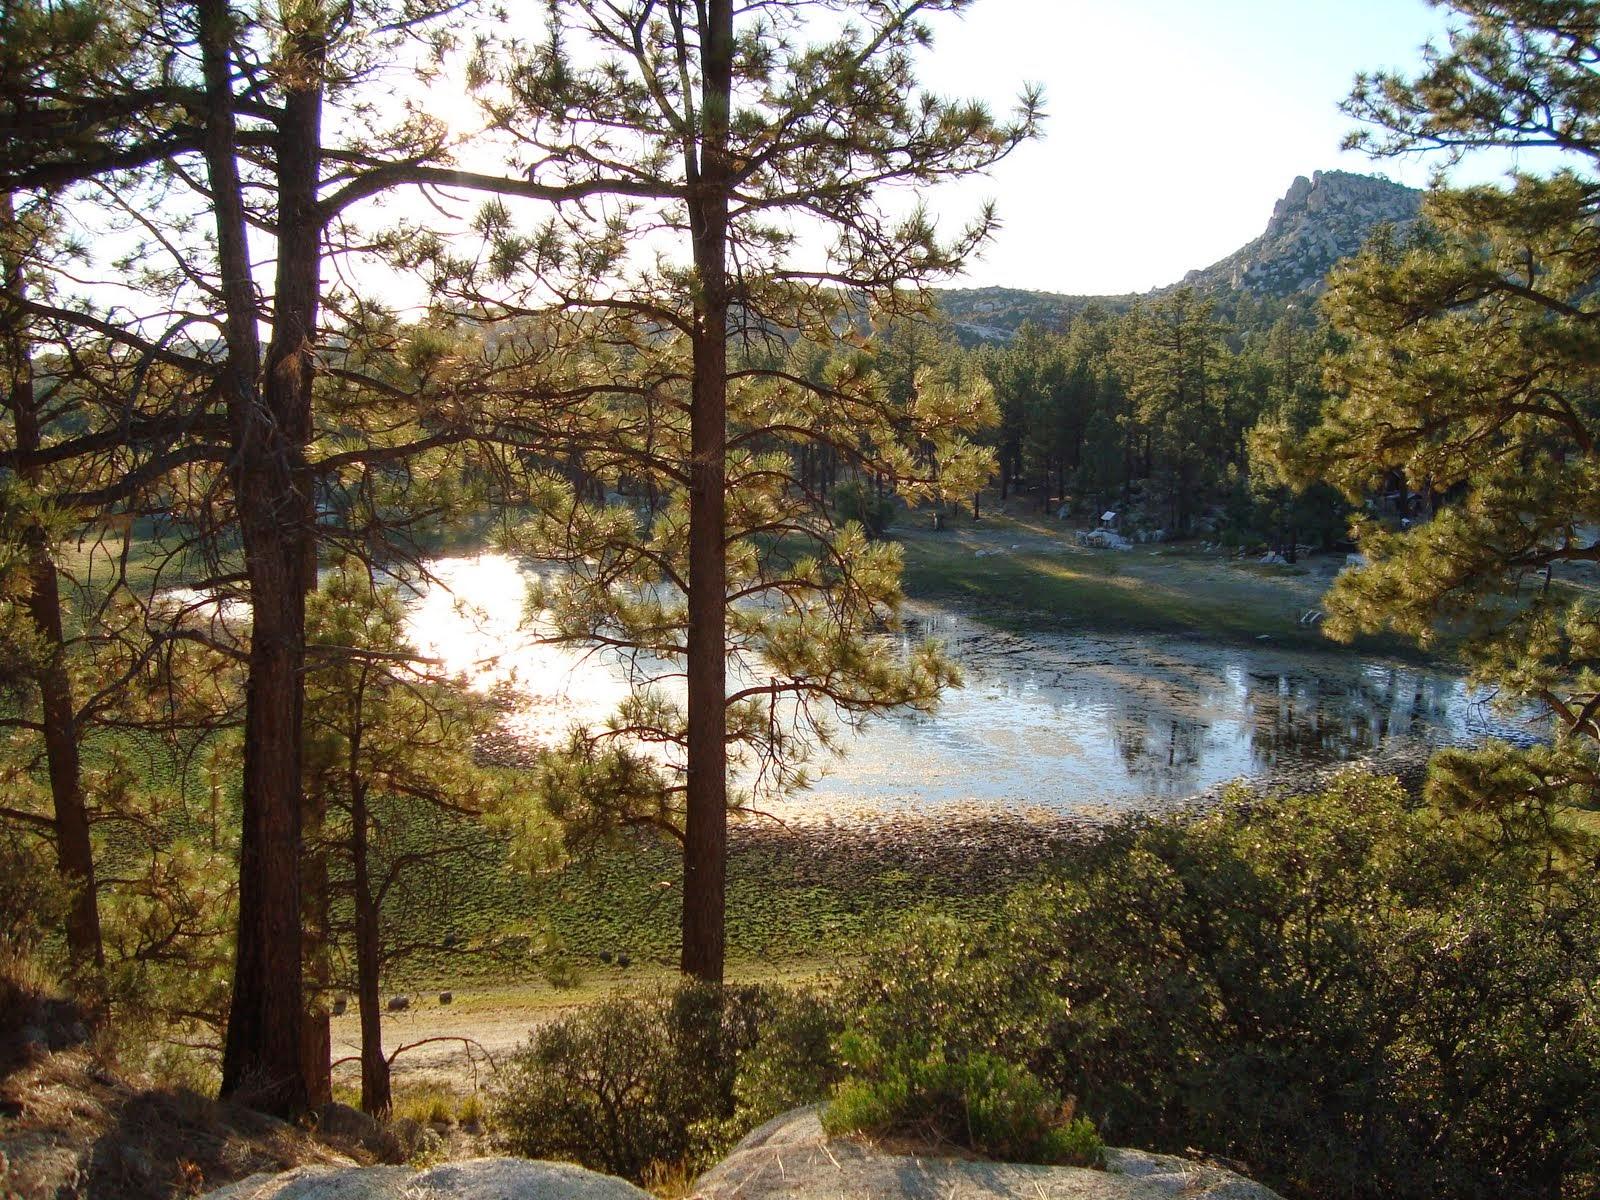 El nombre de la laguna proviene del apellido de Jacob B. Hanson.